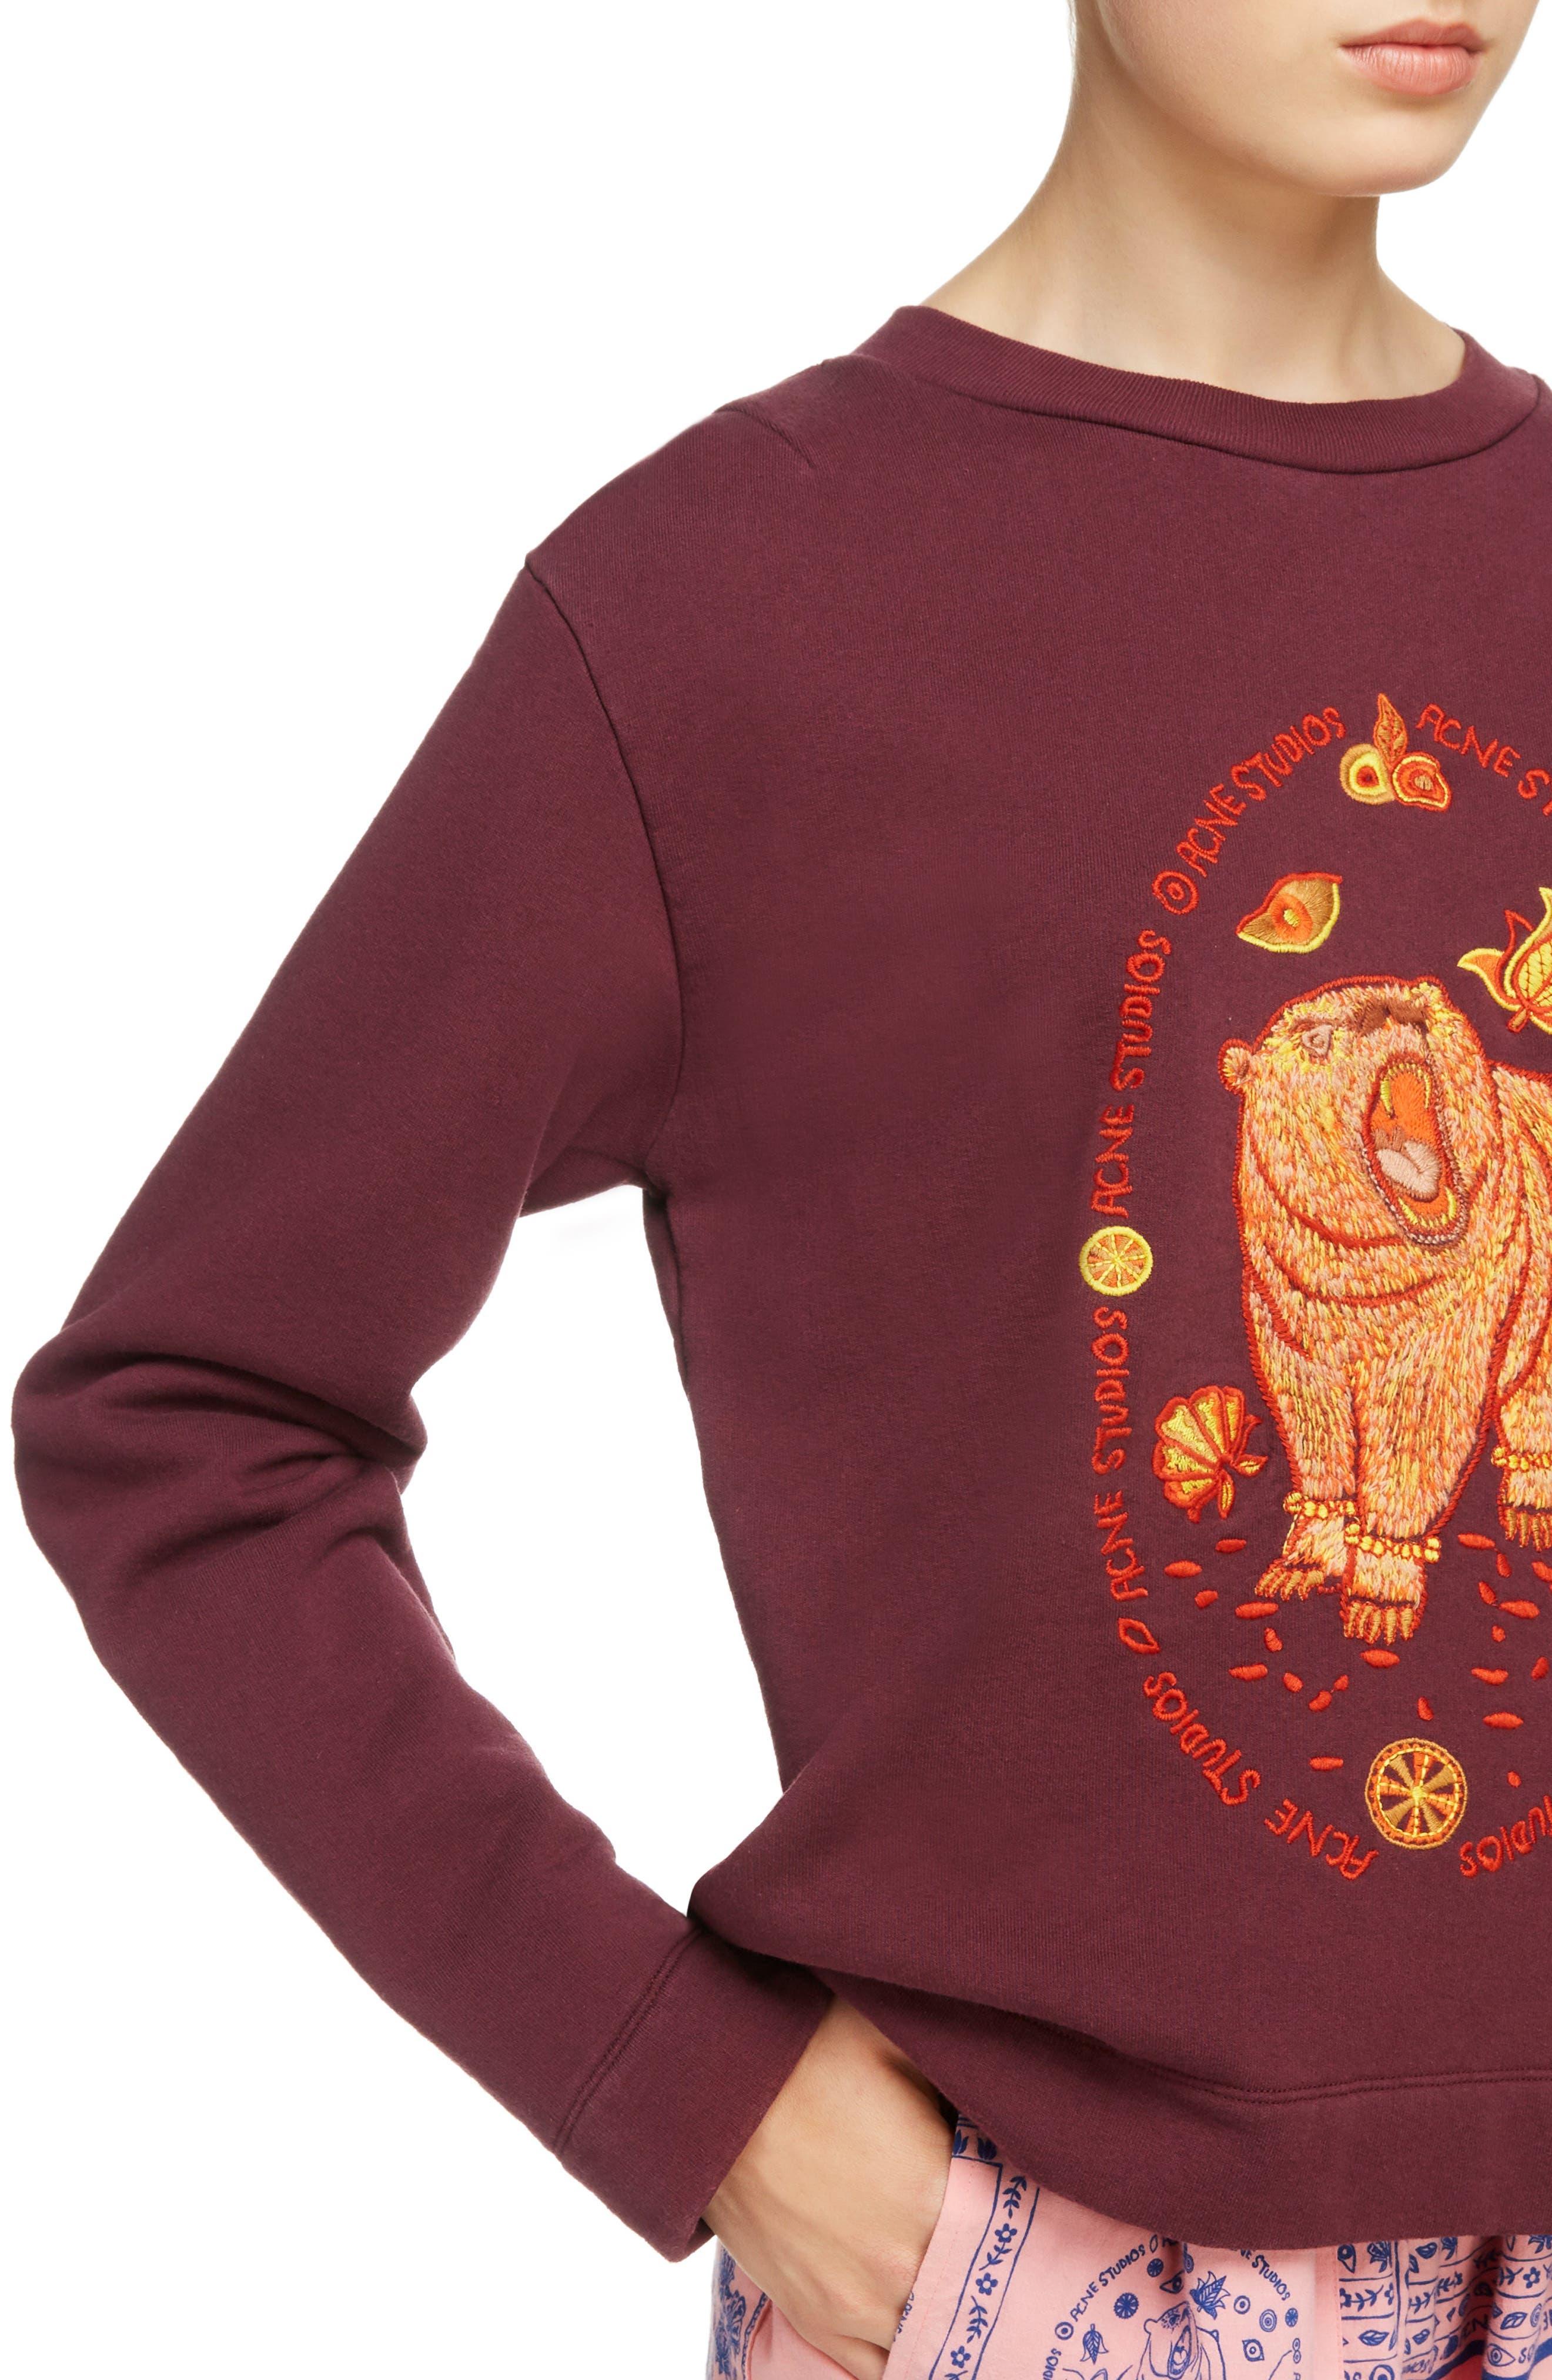 Oslavi Embroidered Bear Sweatshirt,                             Alternate thumbnail 4, color,